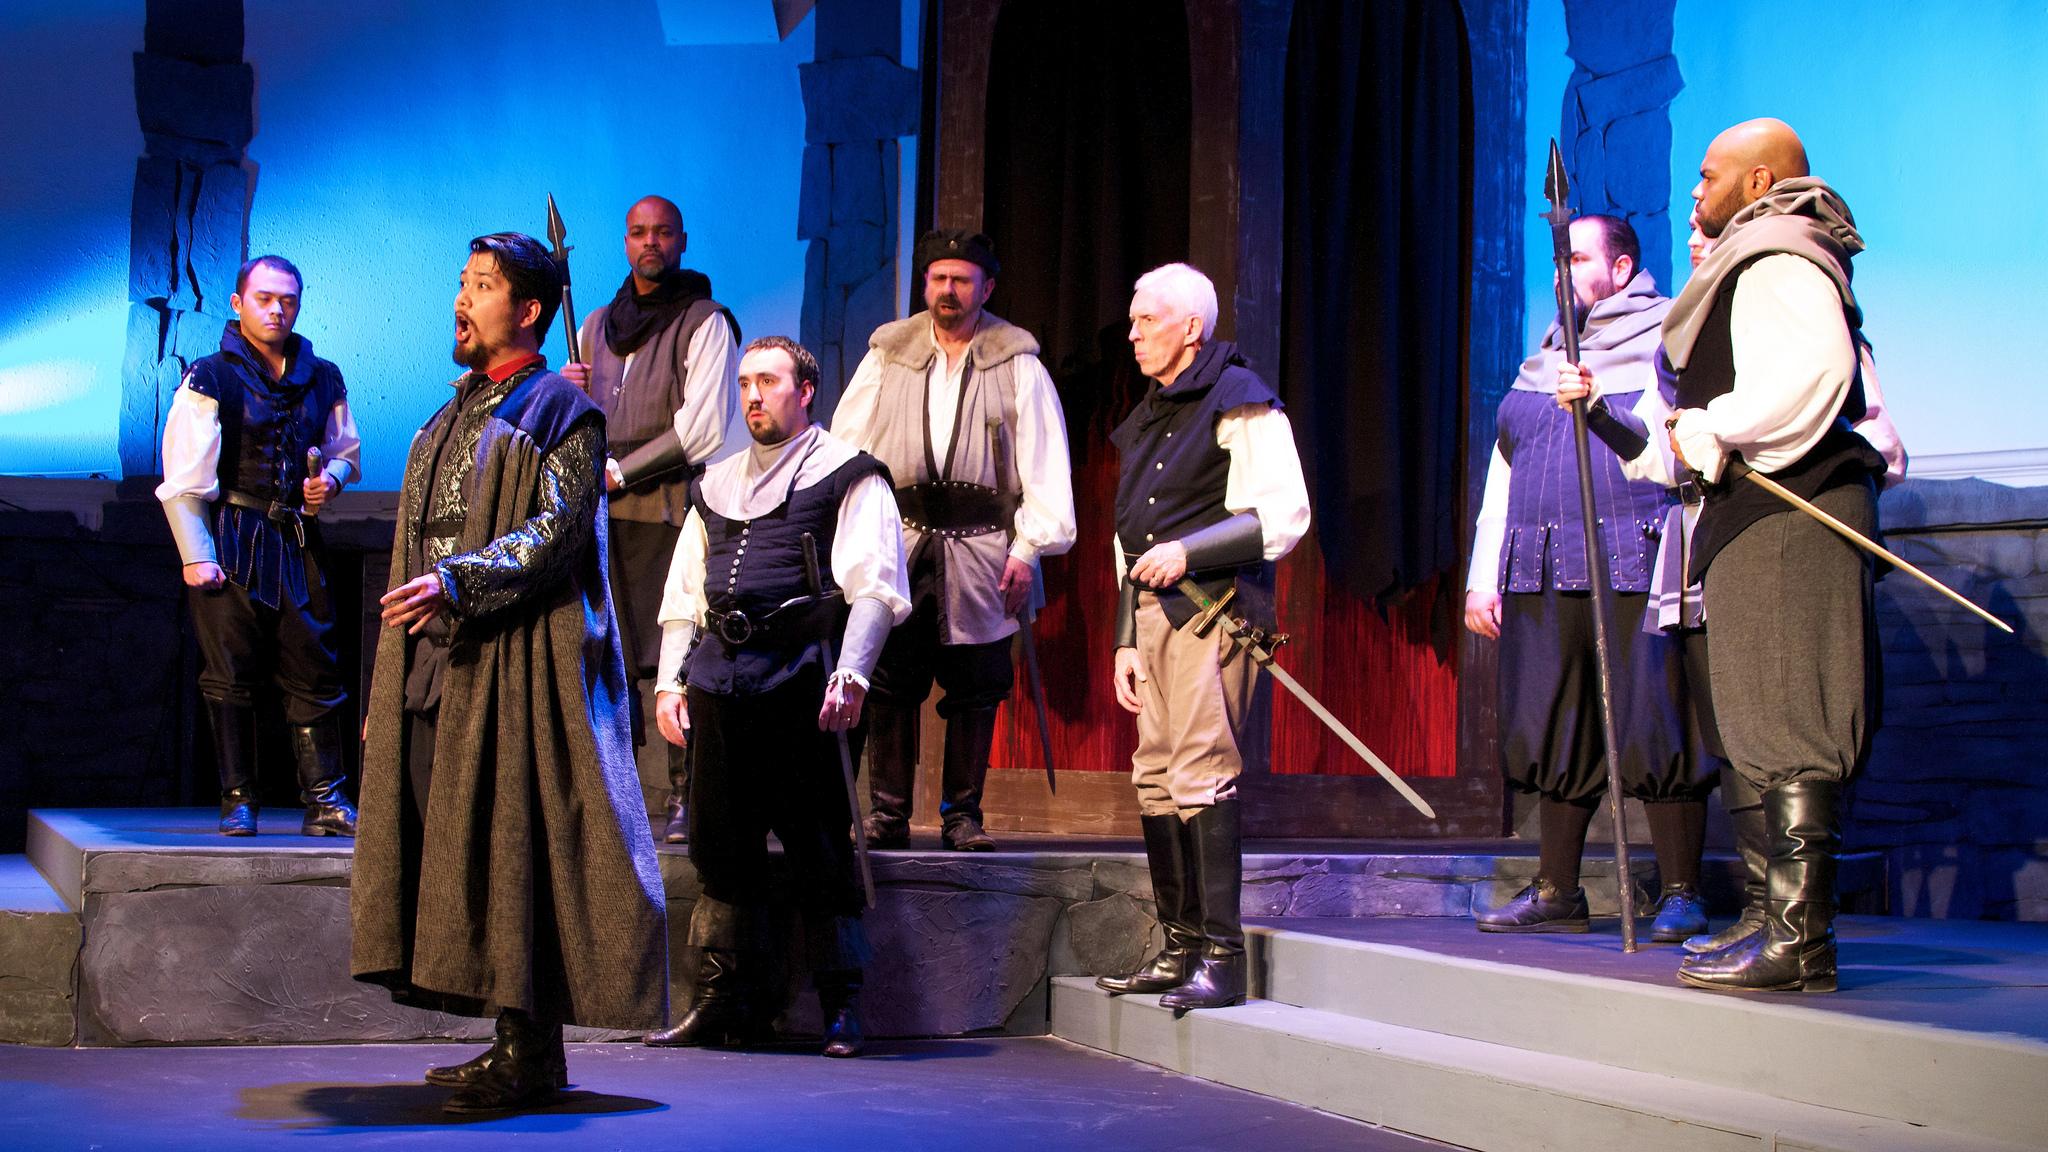 'Il Trovatore' de Verdi, en el Teatro de la Maestranza de Sevilla